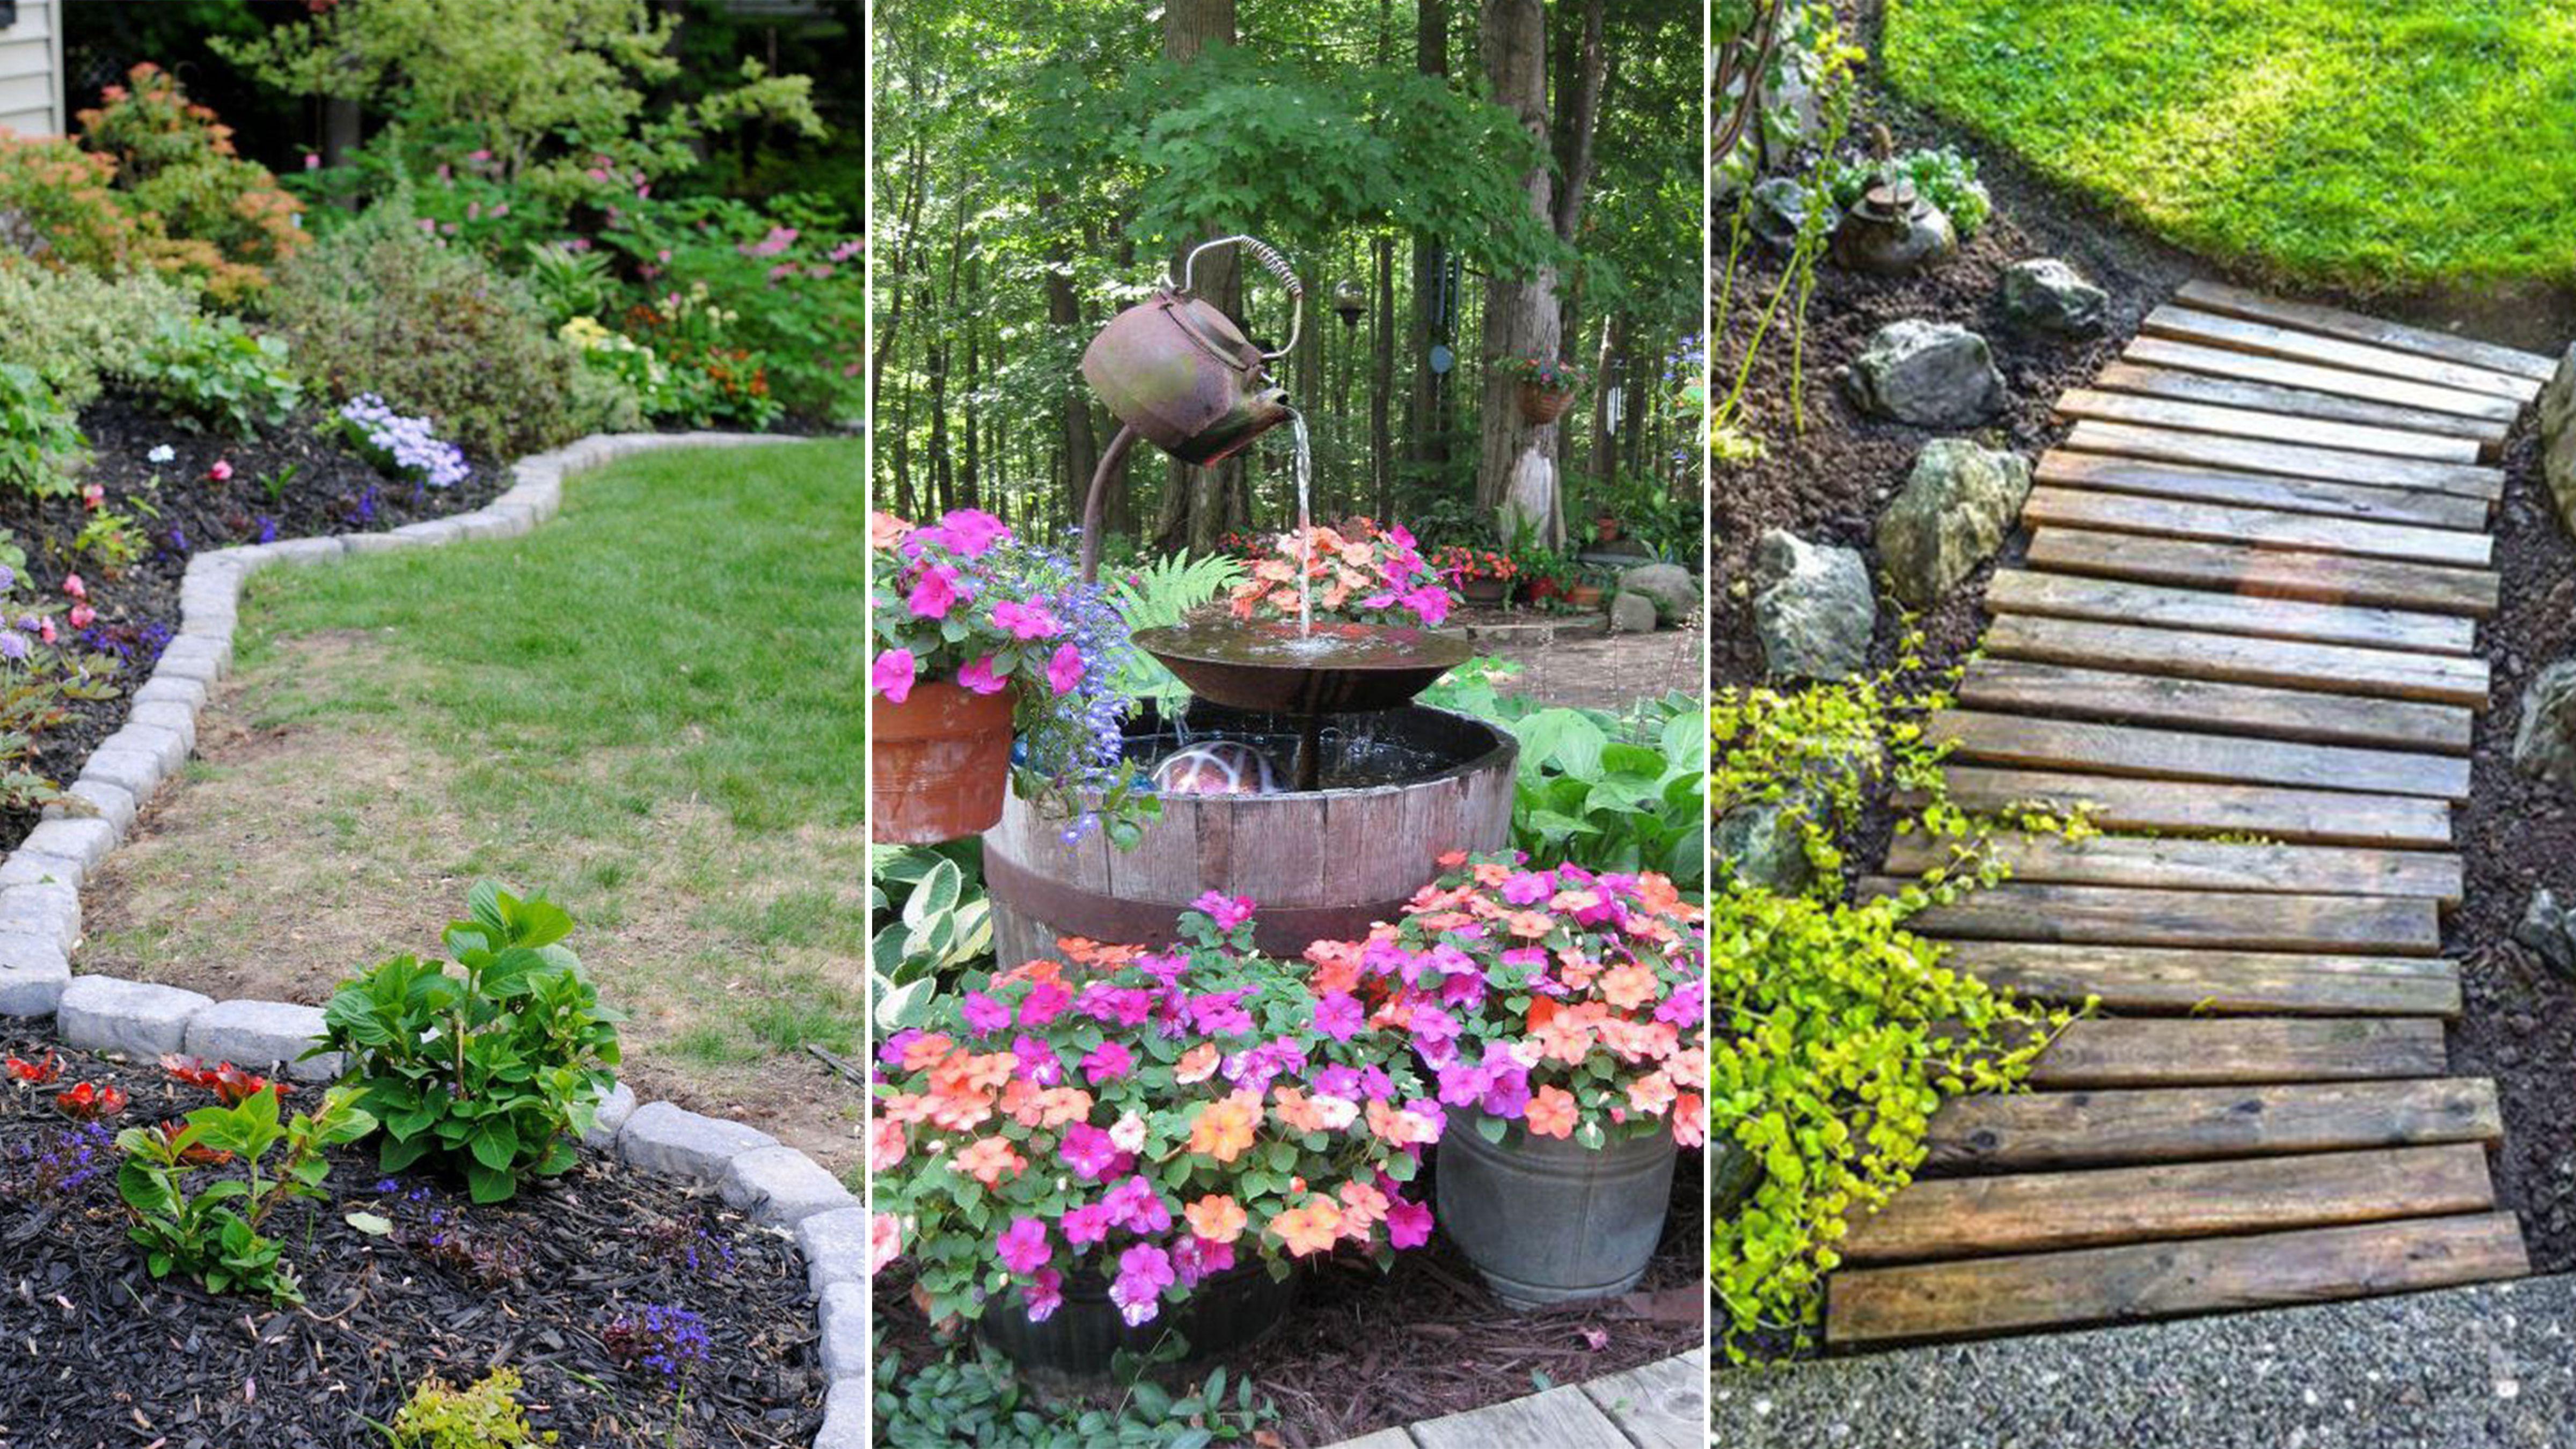 gardening ideas 14 cheap landscaping ideas - budget-friendly landscape tips for front yard TERUJID